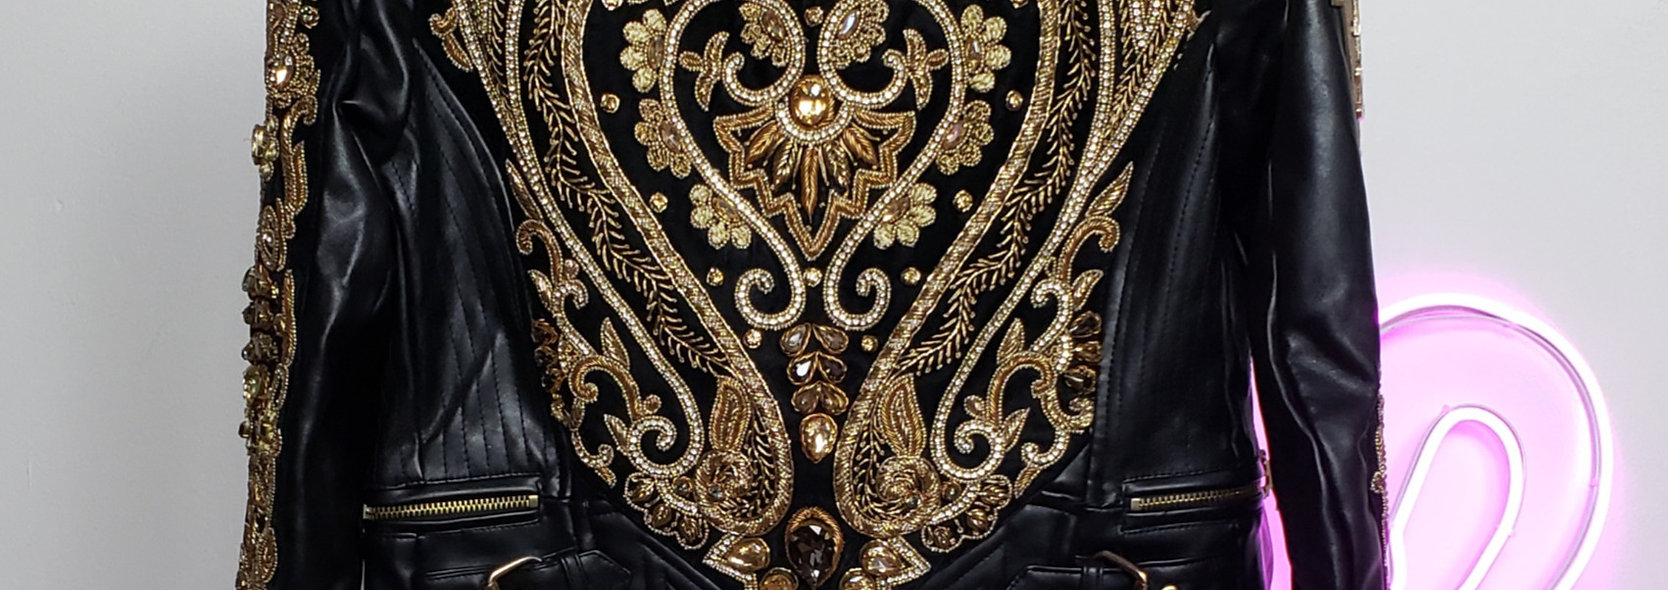 Vampires Wife Jacket